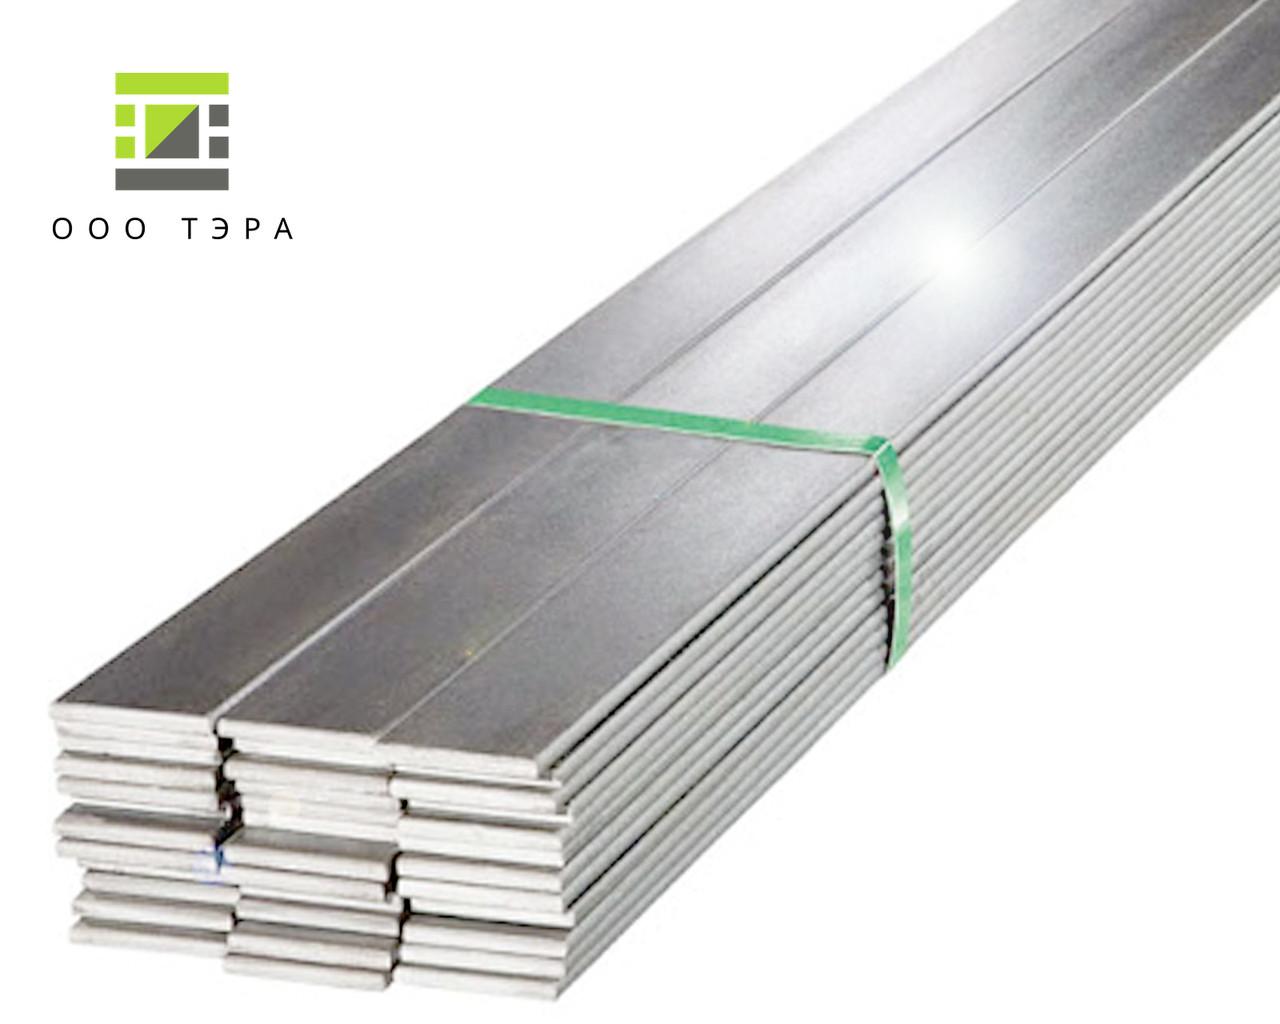 Алюминиевая полоса, шина 40 мм 6060 Т6 (АД31Т) электротехническая 40х2; 40х3; 40х5; 40х8; 40х10; 40х12; 40х20.